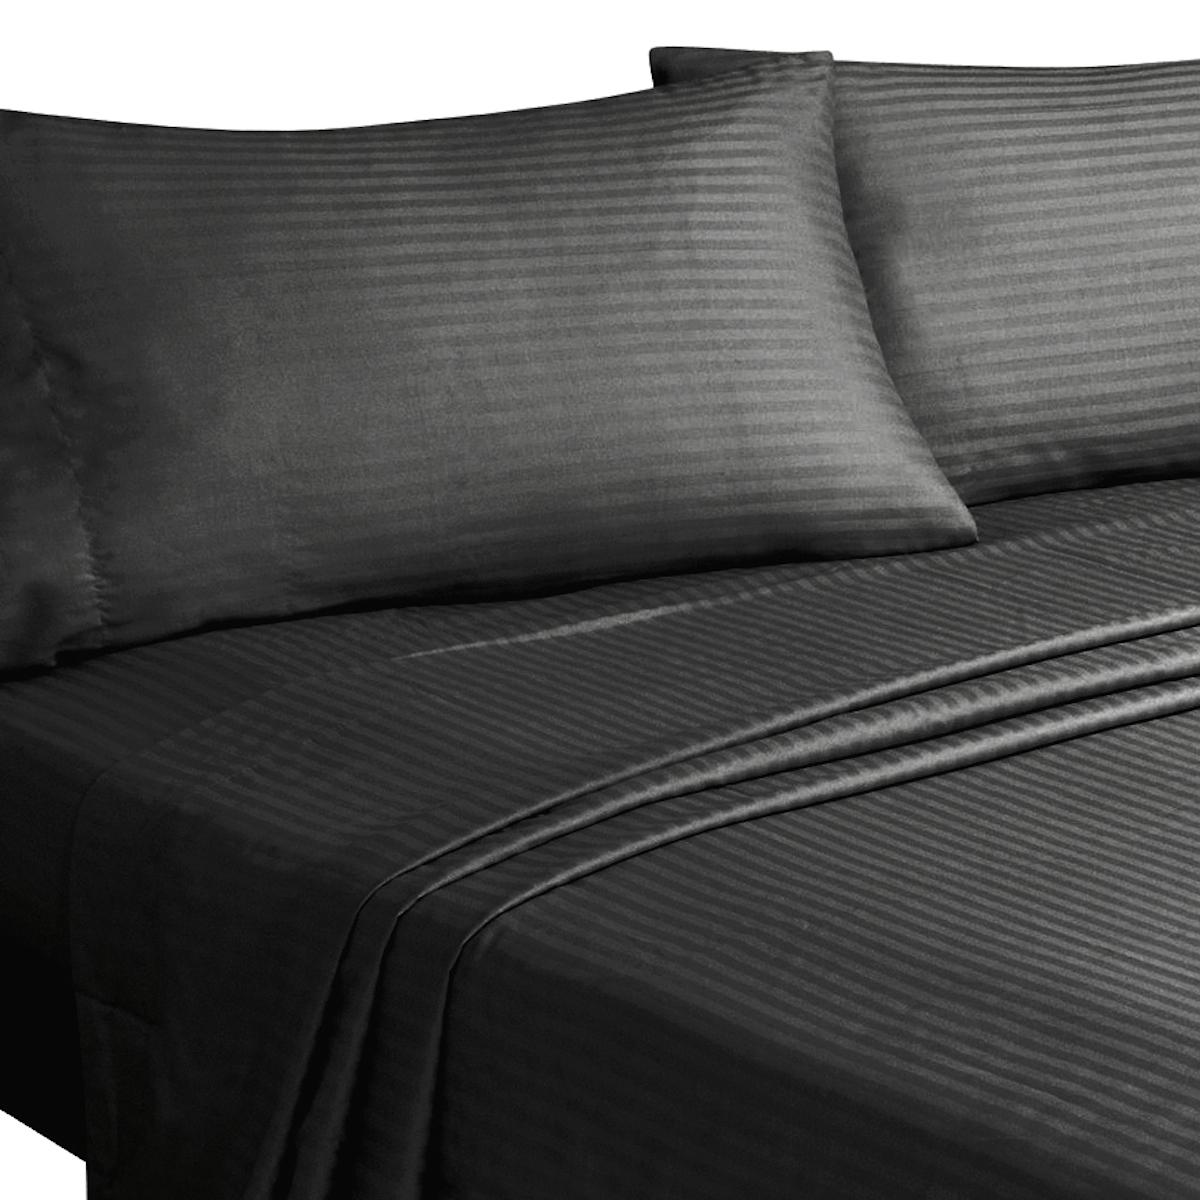 sheet set fitted mattress linens king queen full dobby stripe choose